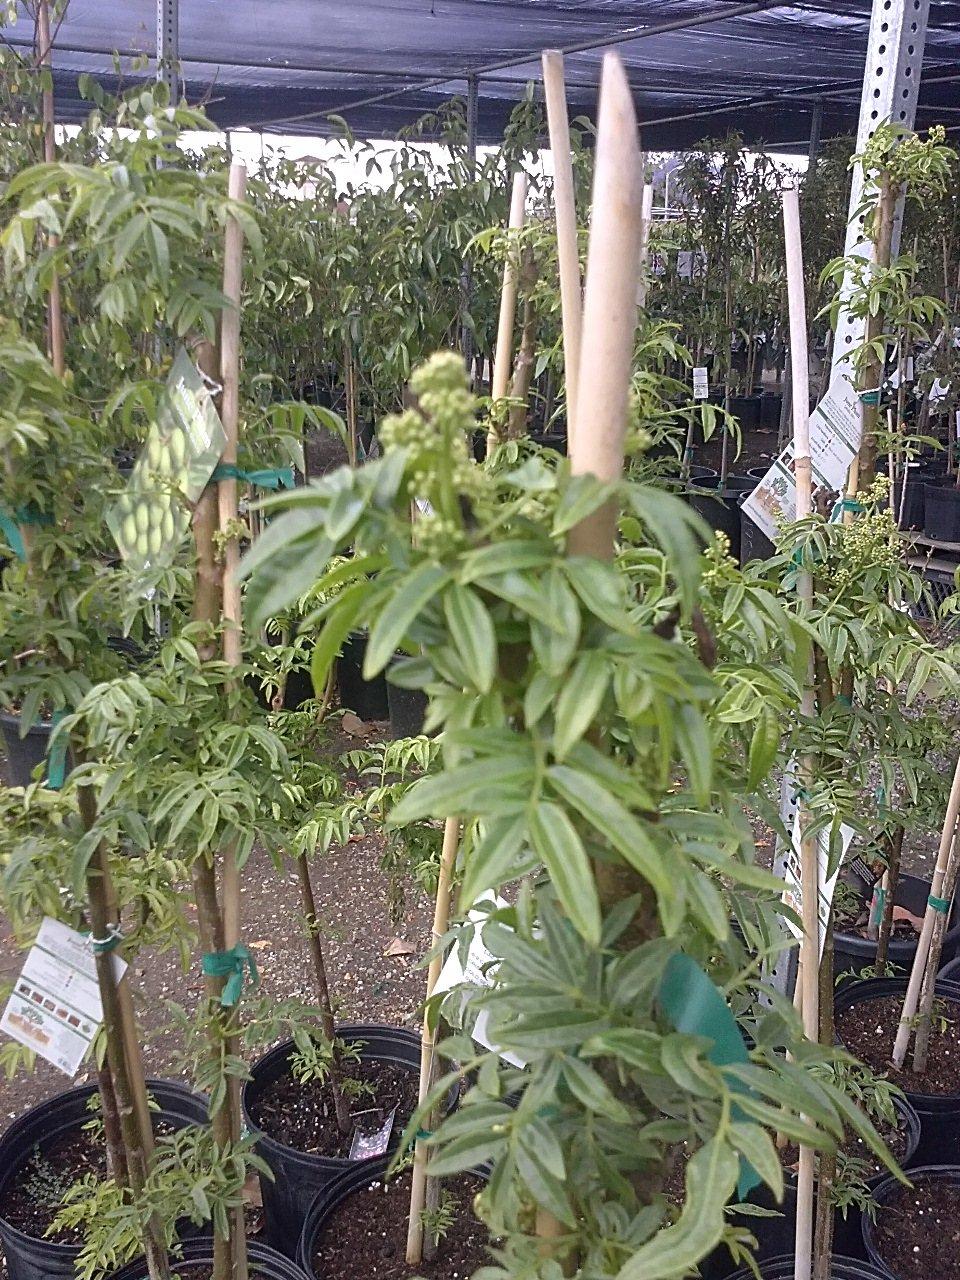 9EzTropical - June Plum Tropial Fruit Trees - 3 Feet Tall - Ship in 3 Gal Pot